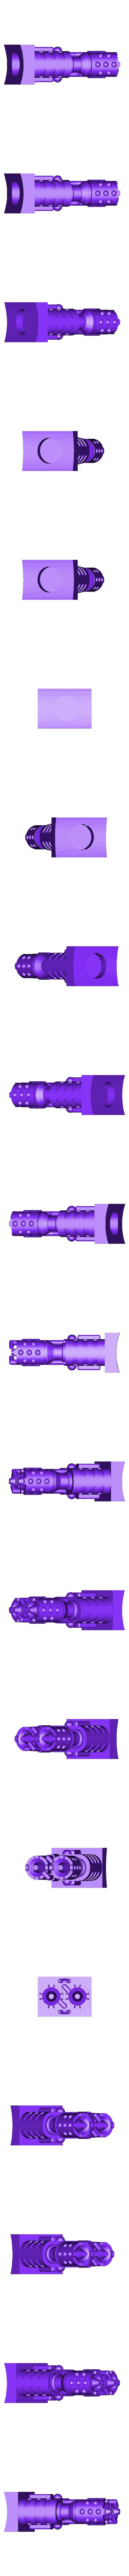 Gun_HeavyFlamer.stl Download free STL file Catoblepas SPG • 3D printable design, nfeyma